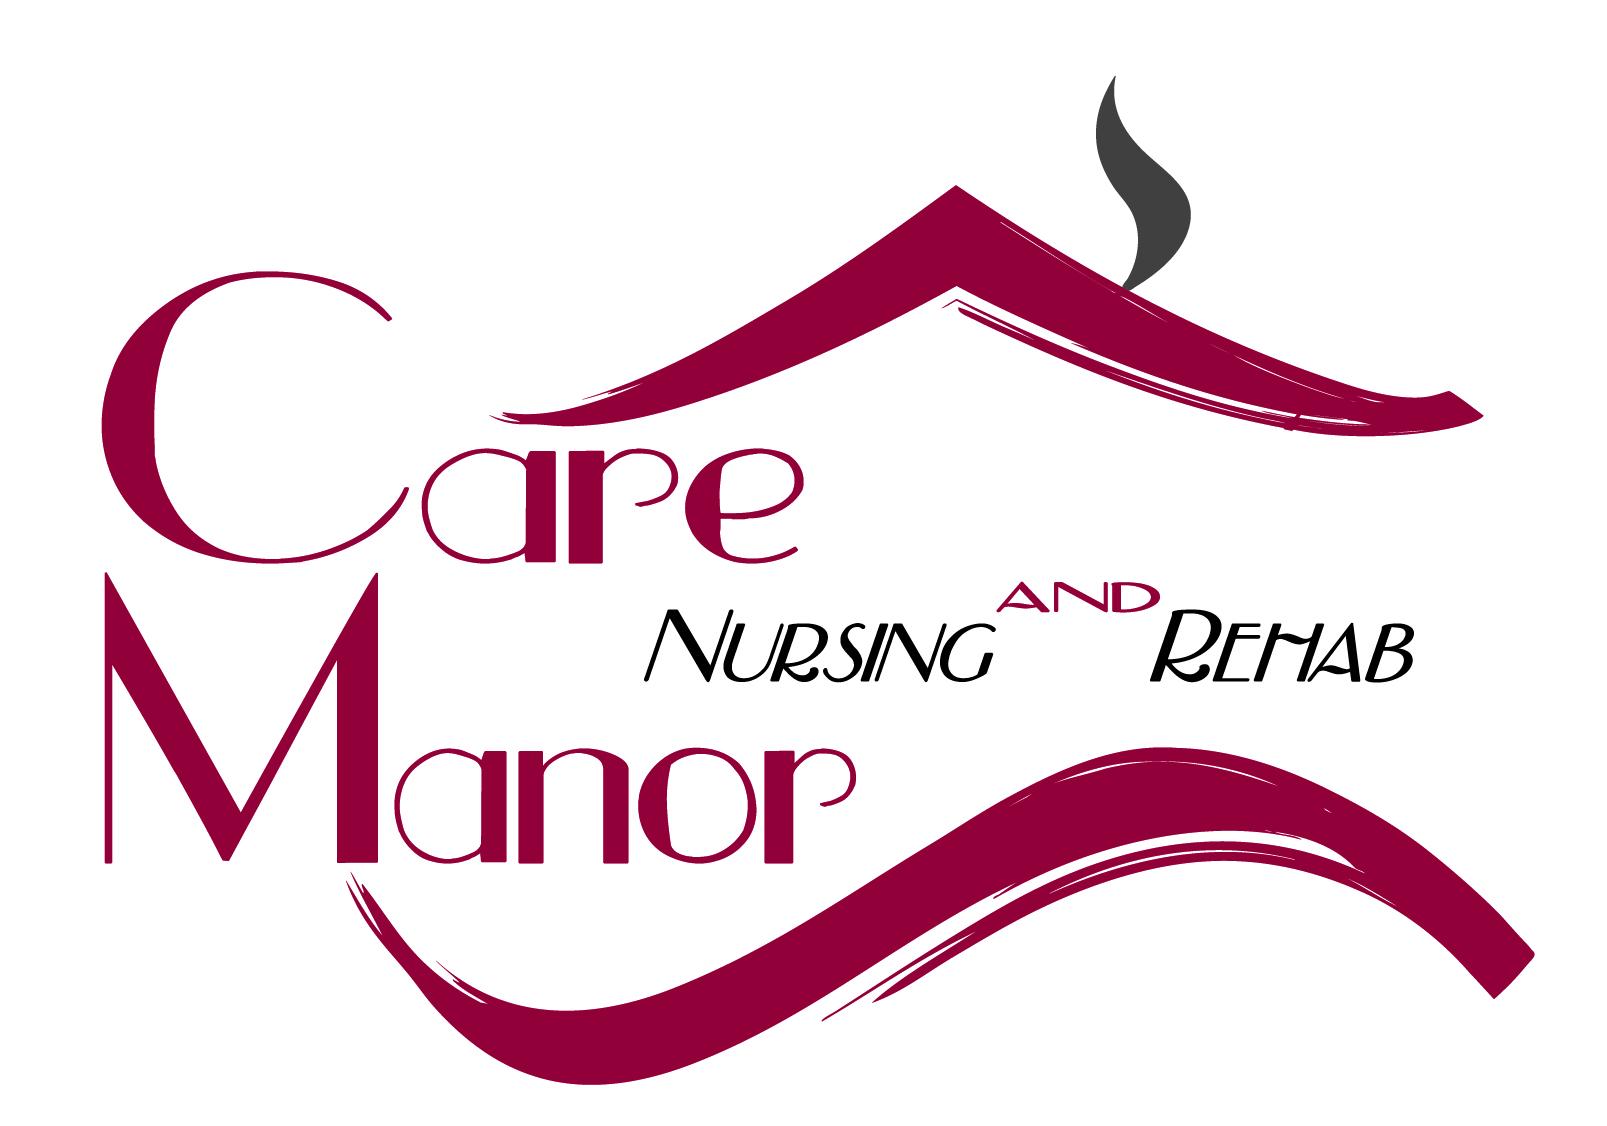 Care Manor Nursing Home